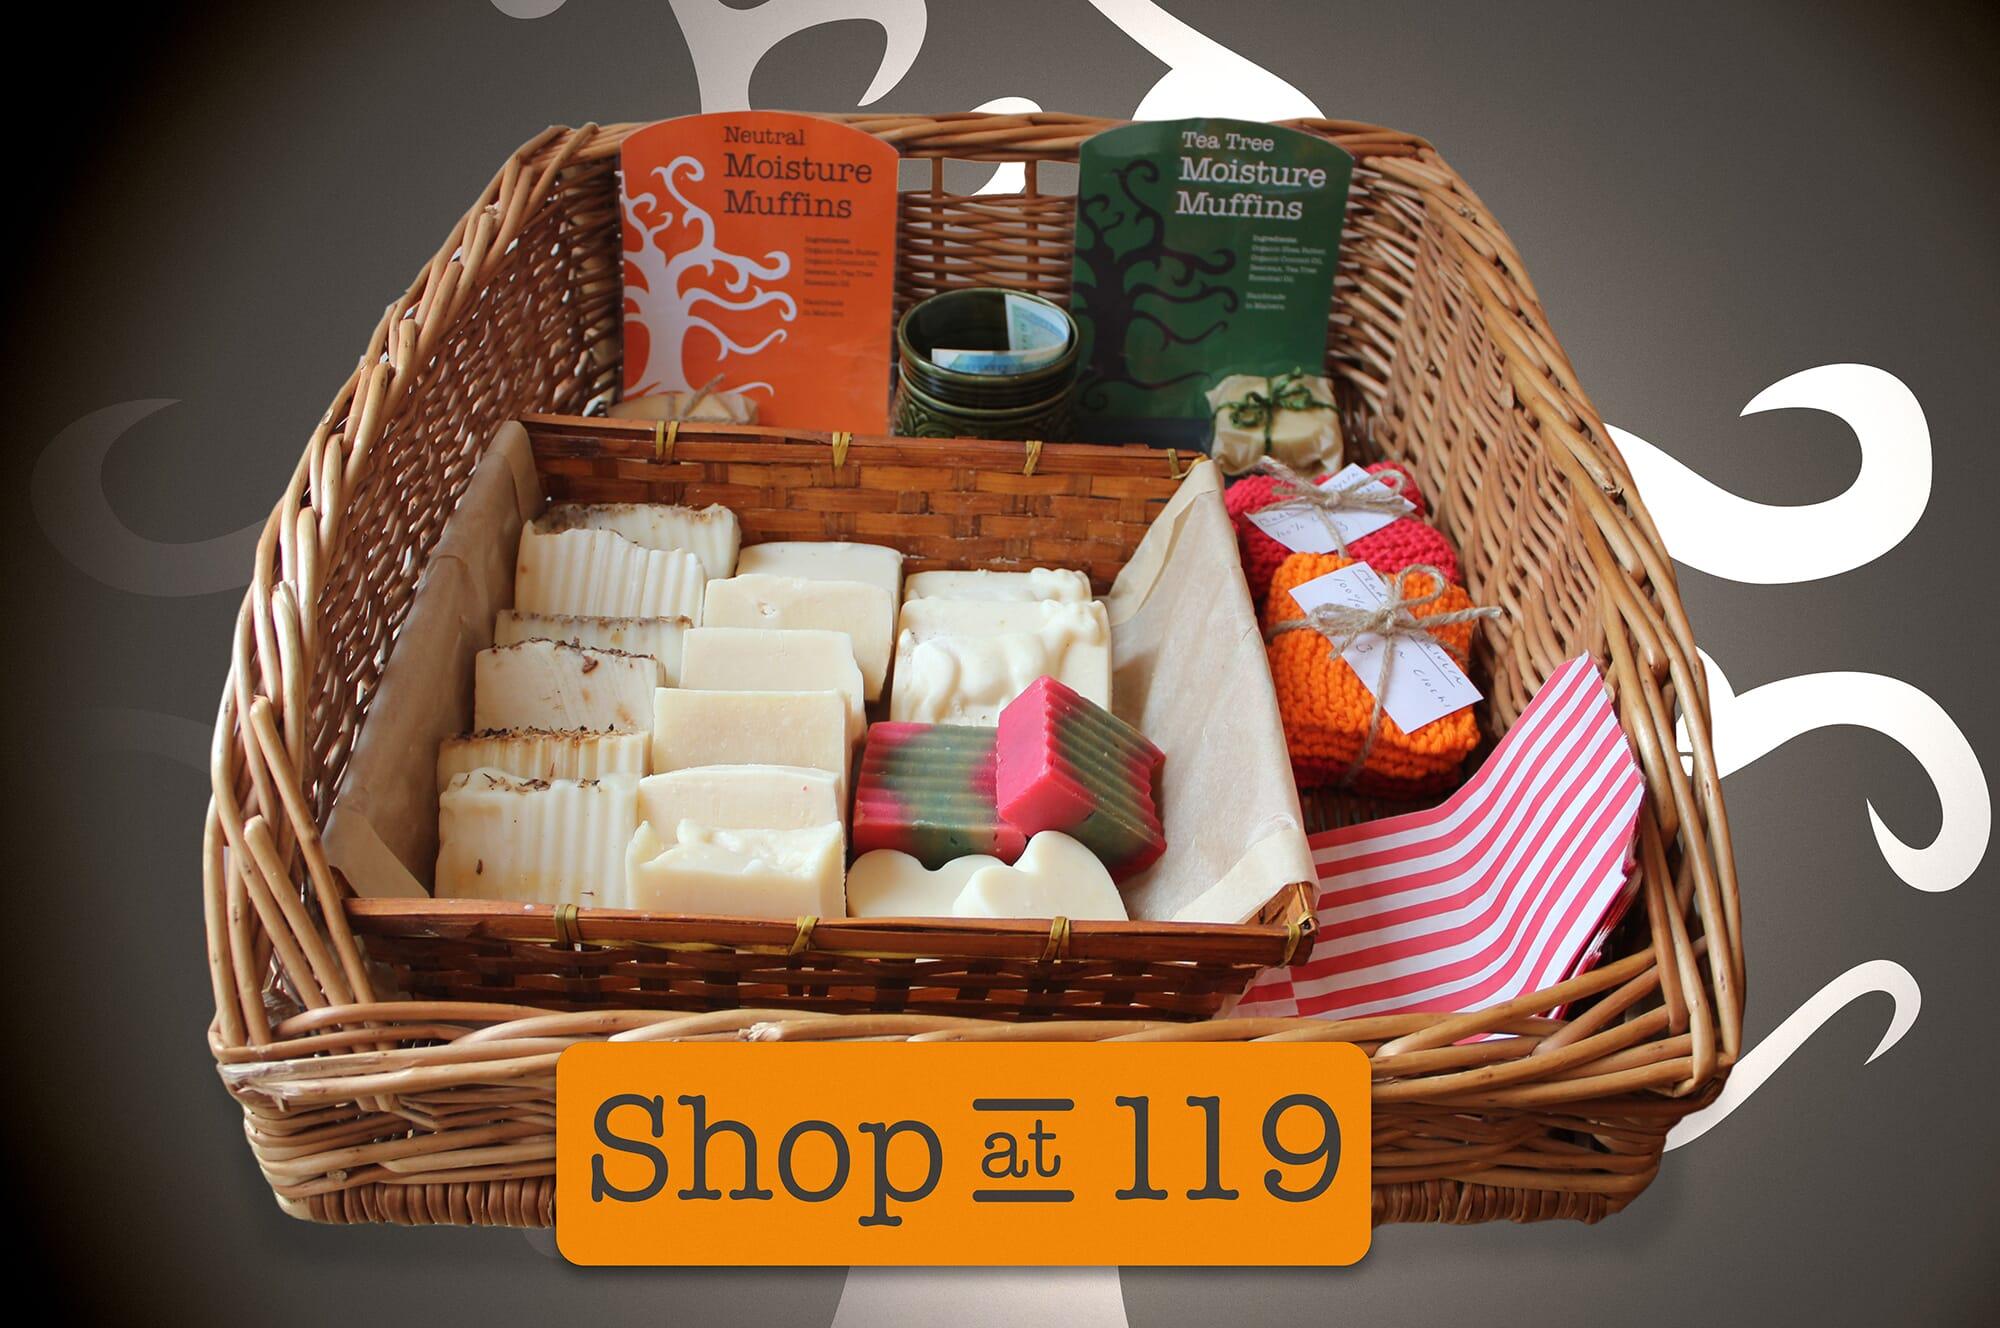 Shop at 119 product basket